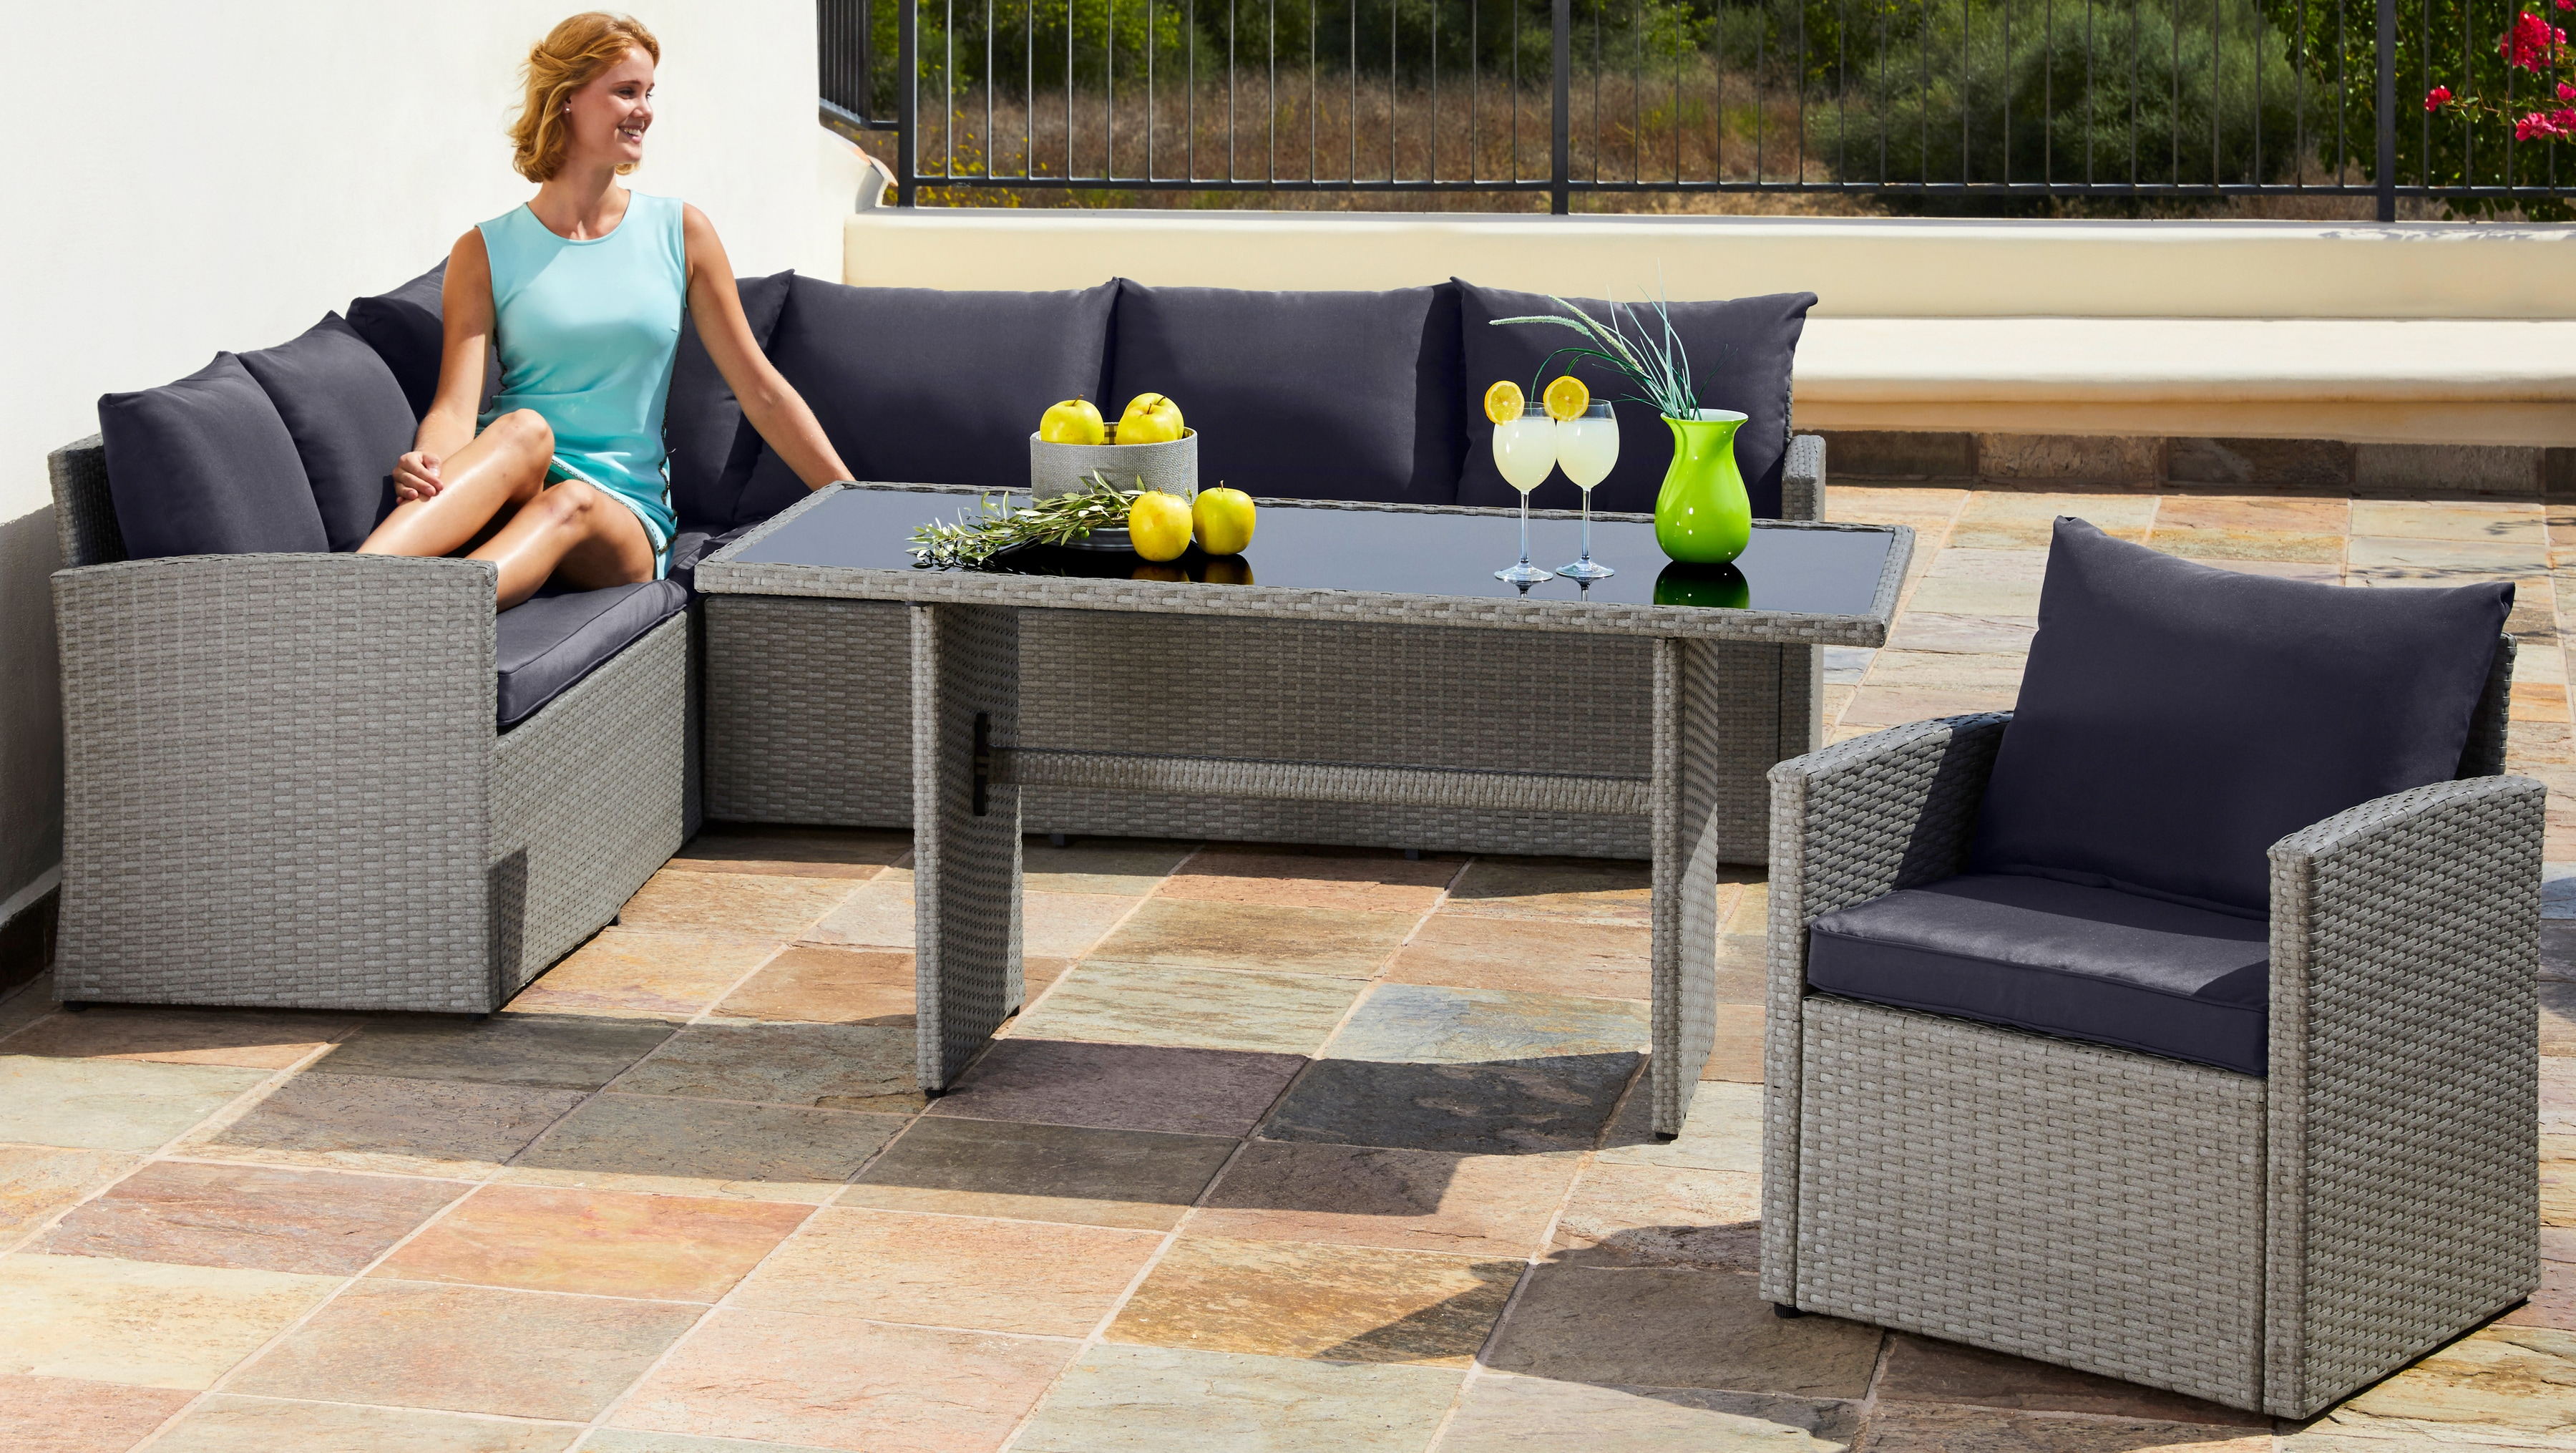 MERXX Loungeset Chicago 14-tlg Eckbank Sessel Tisch 145x70 cm Polyrattan grau